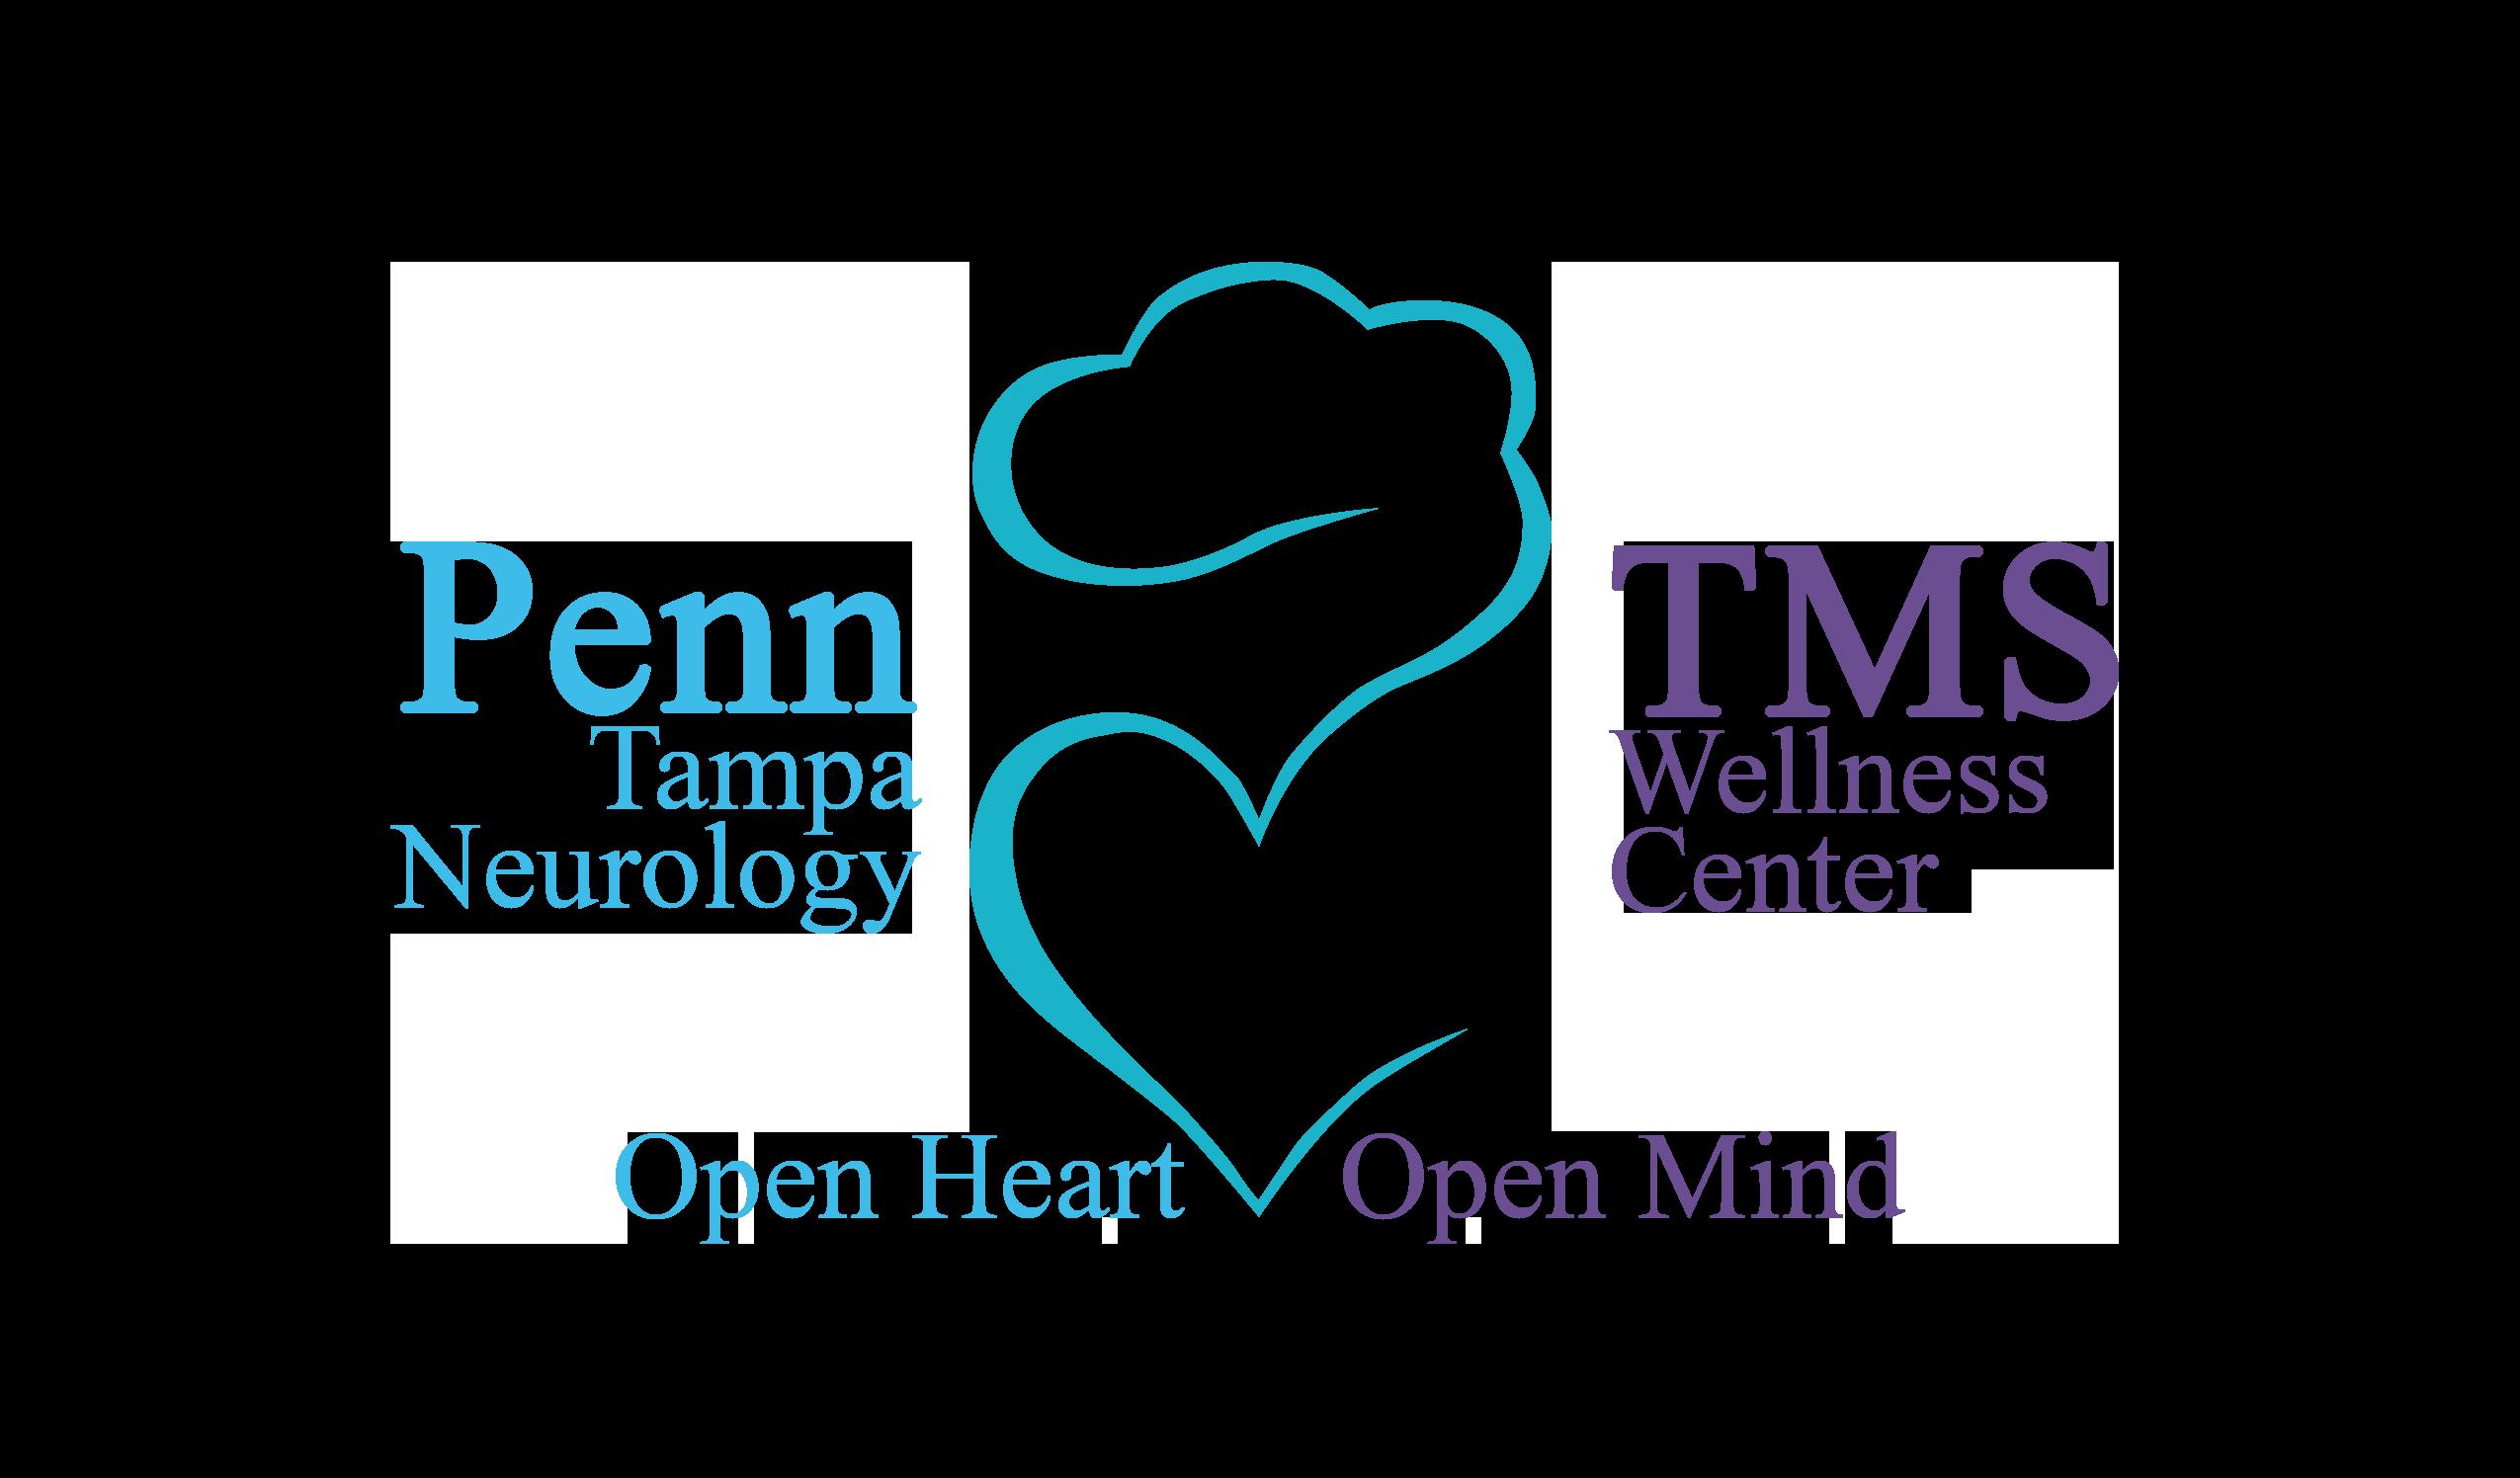 Penn Tampa TMS Logo